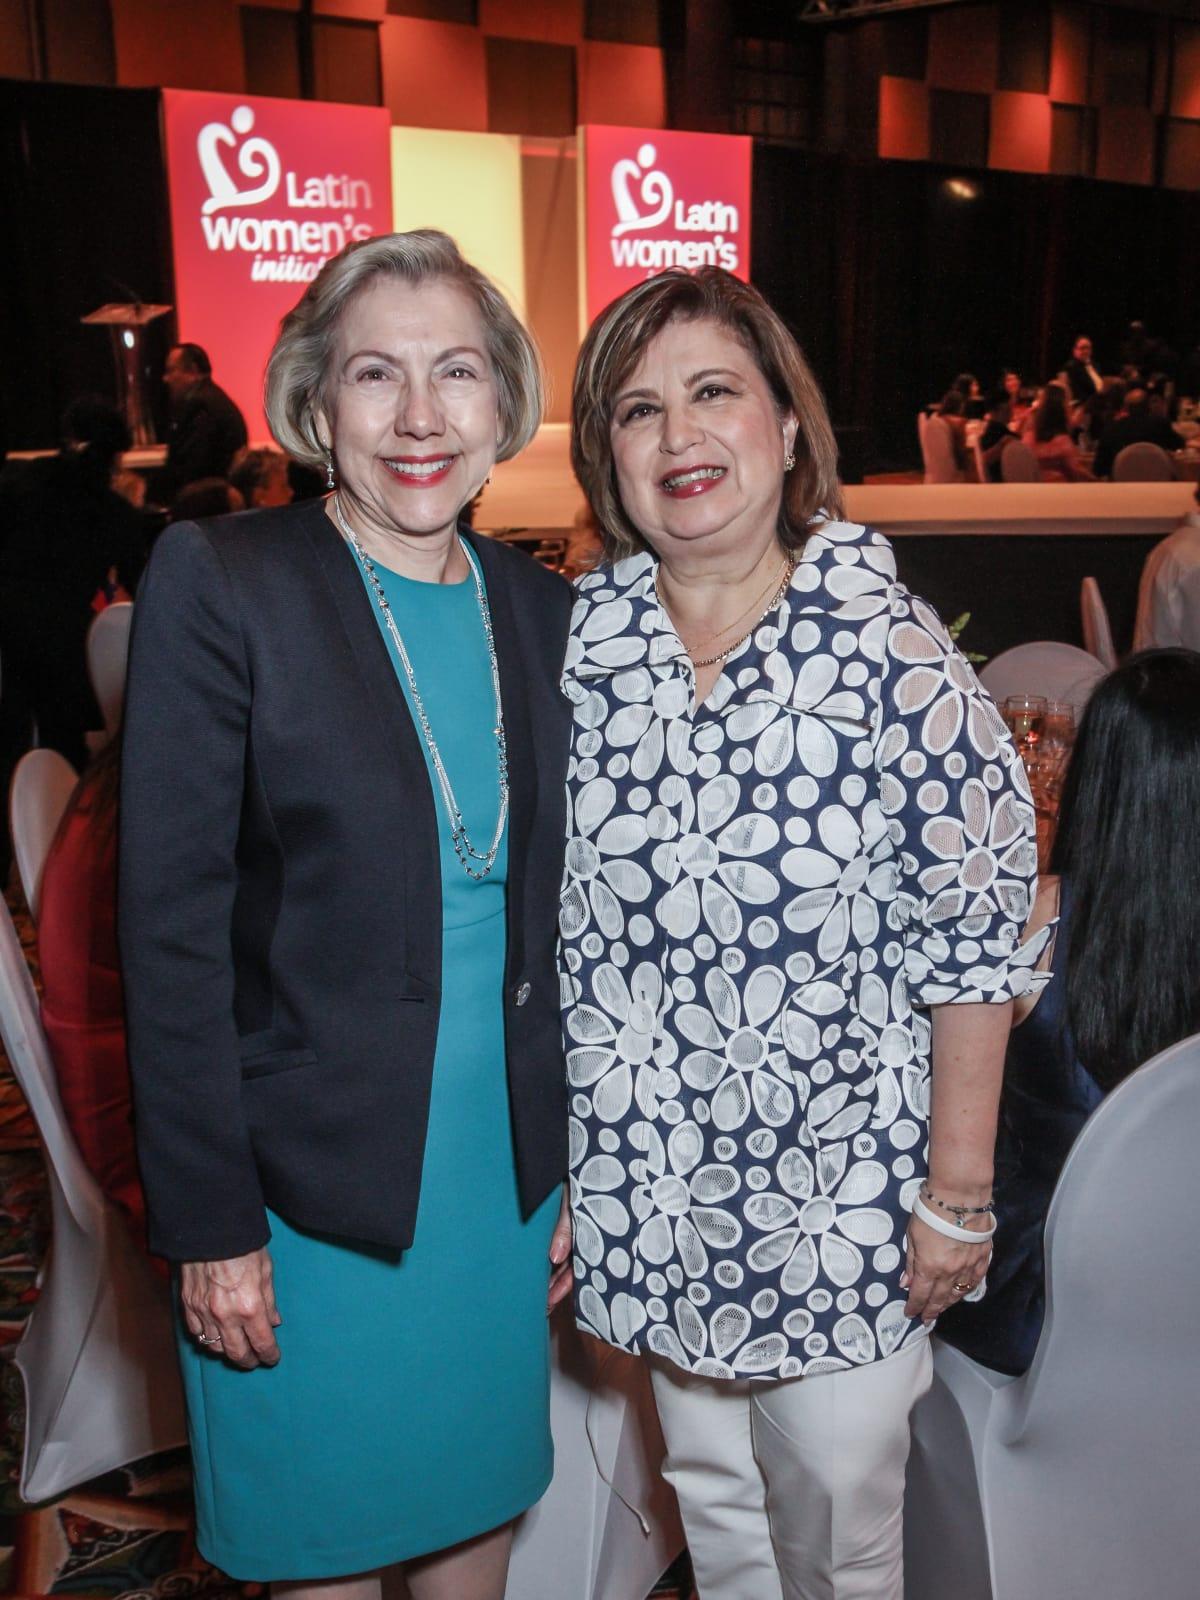 Latin Women's Initiative Luncheon, Elva Flores and Leticia Fallick